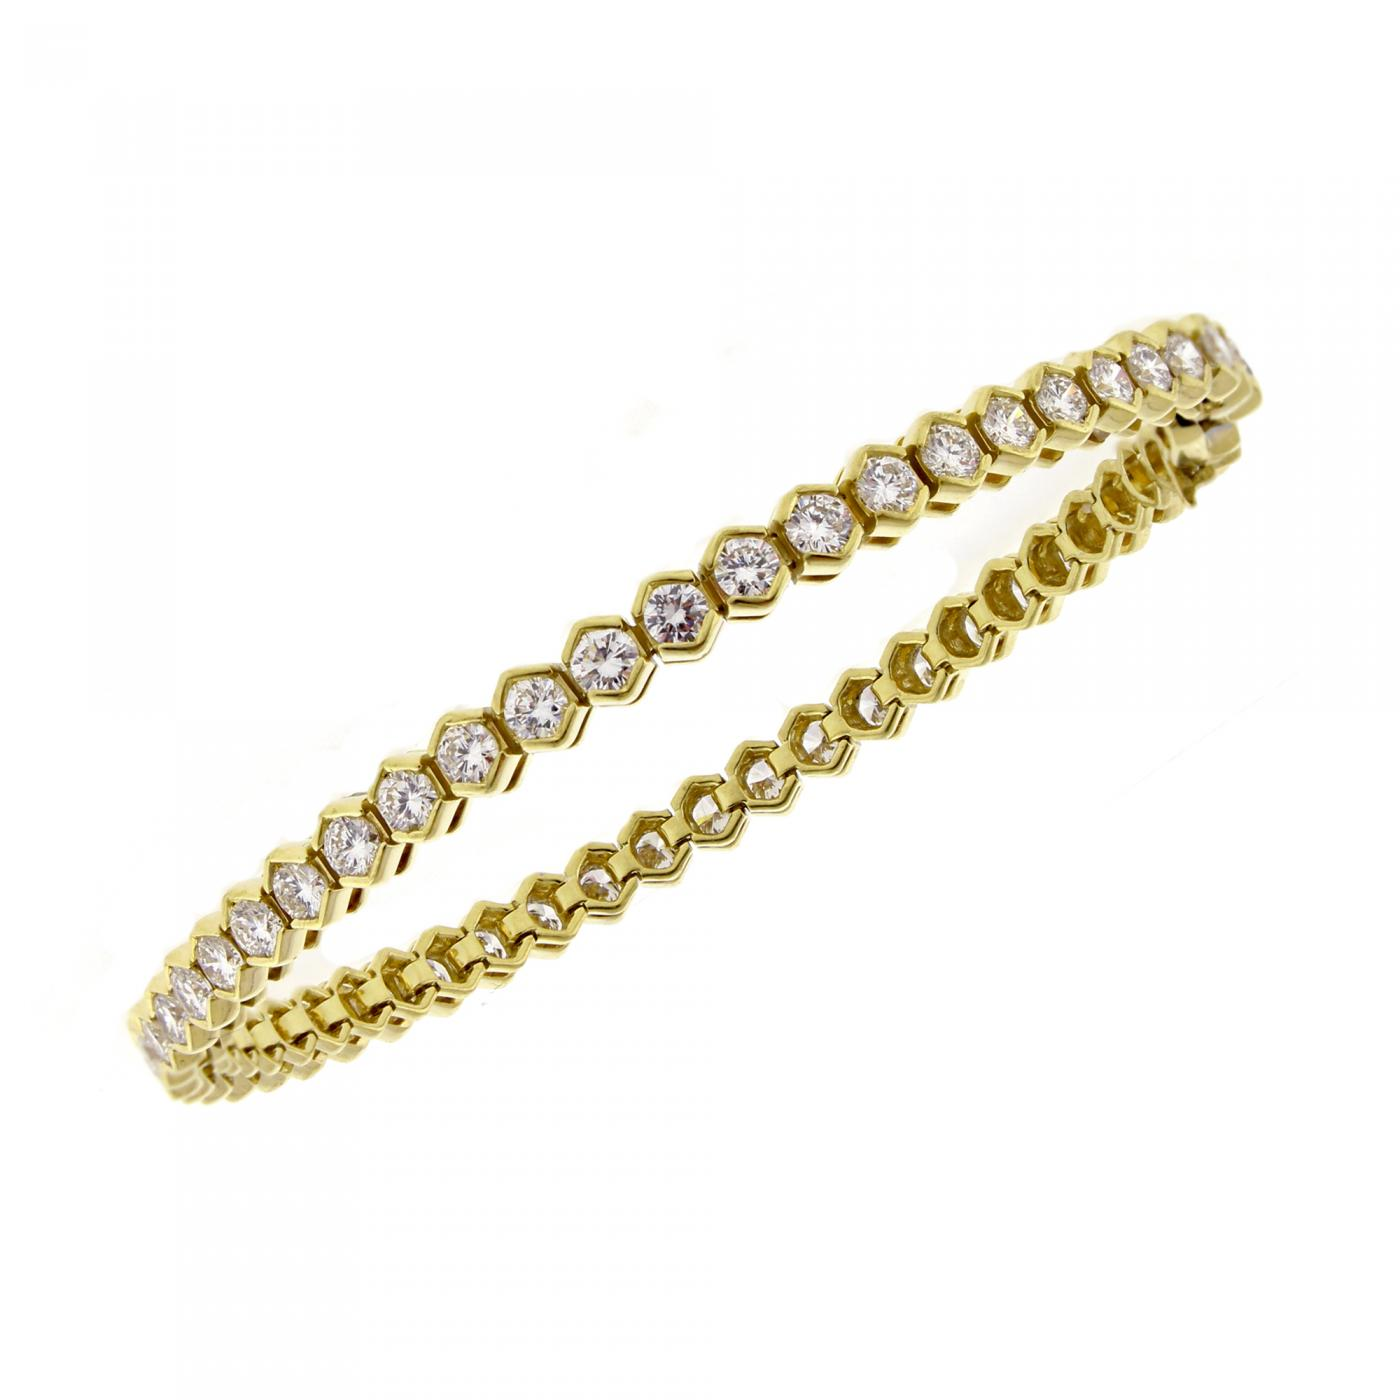 Tiffany Co Tiffany Co Diamond 18 Karat Gold Tennis Bracelet